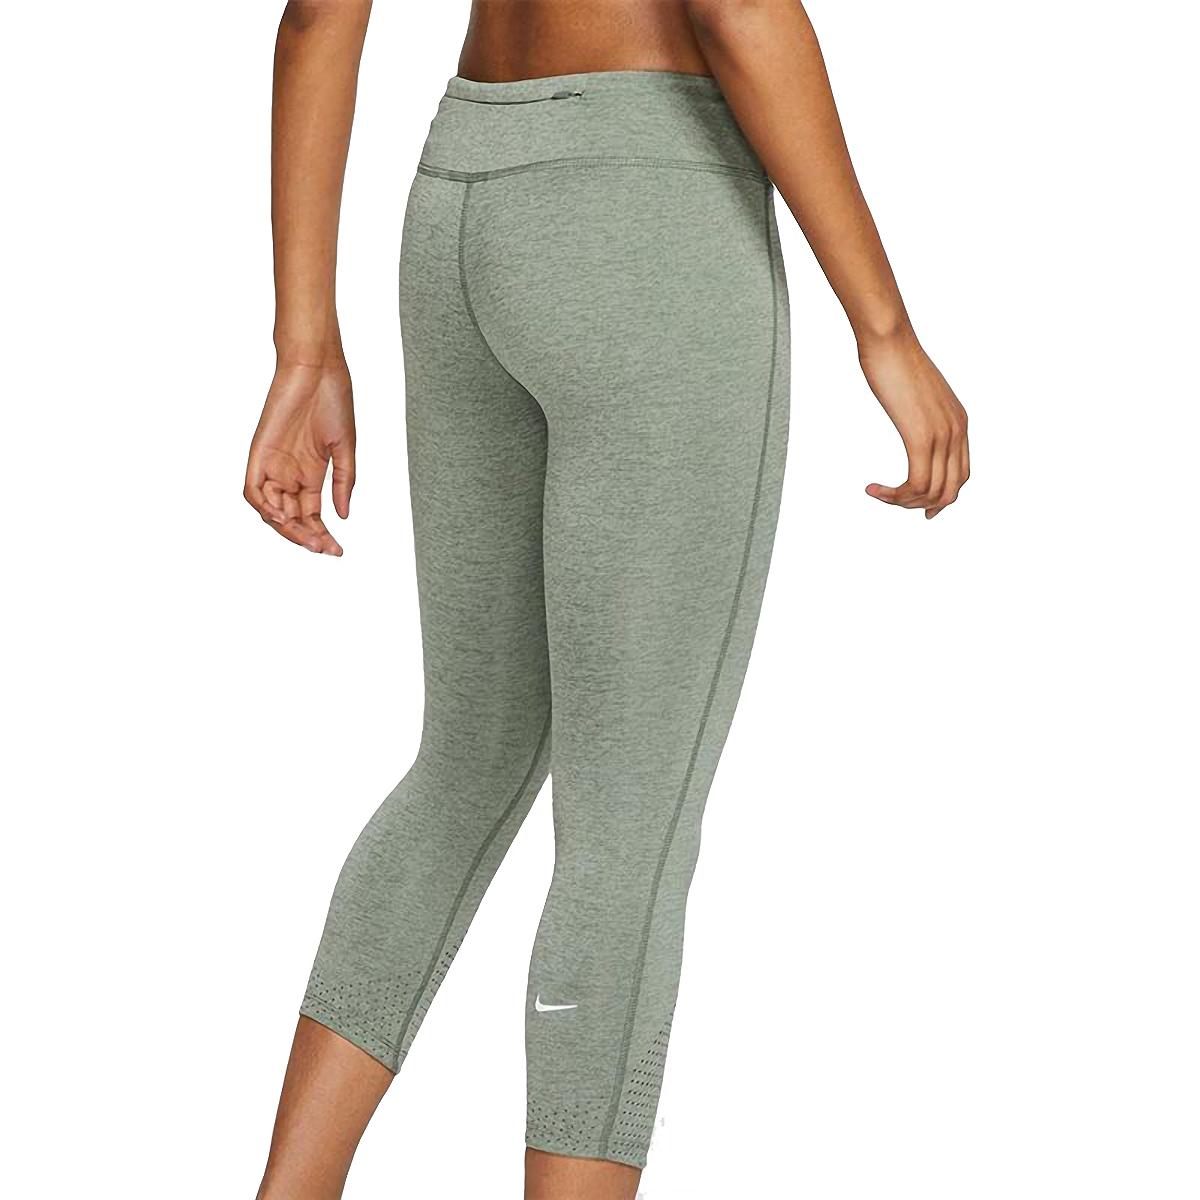 Women's Nike Epic Luxe Crop   - Color: Juniper Fog - Size: XL, Juniper Fog, large, image 2